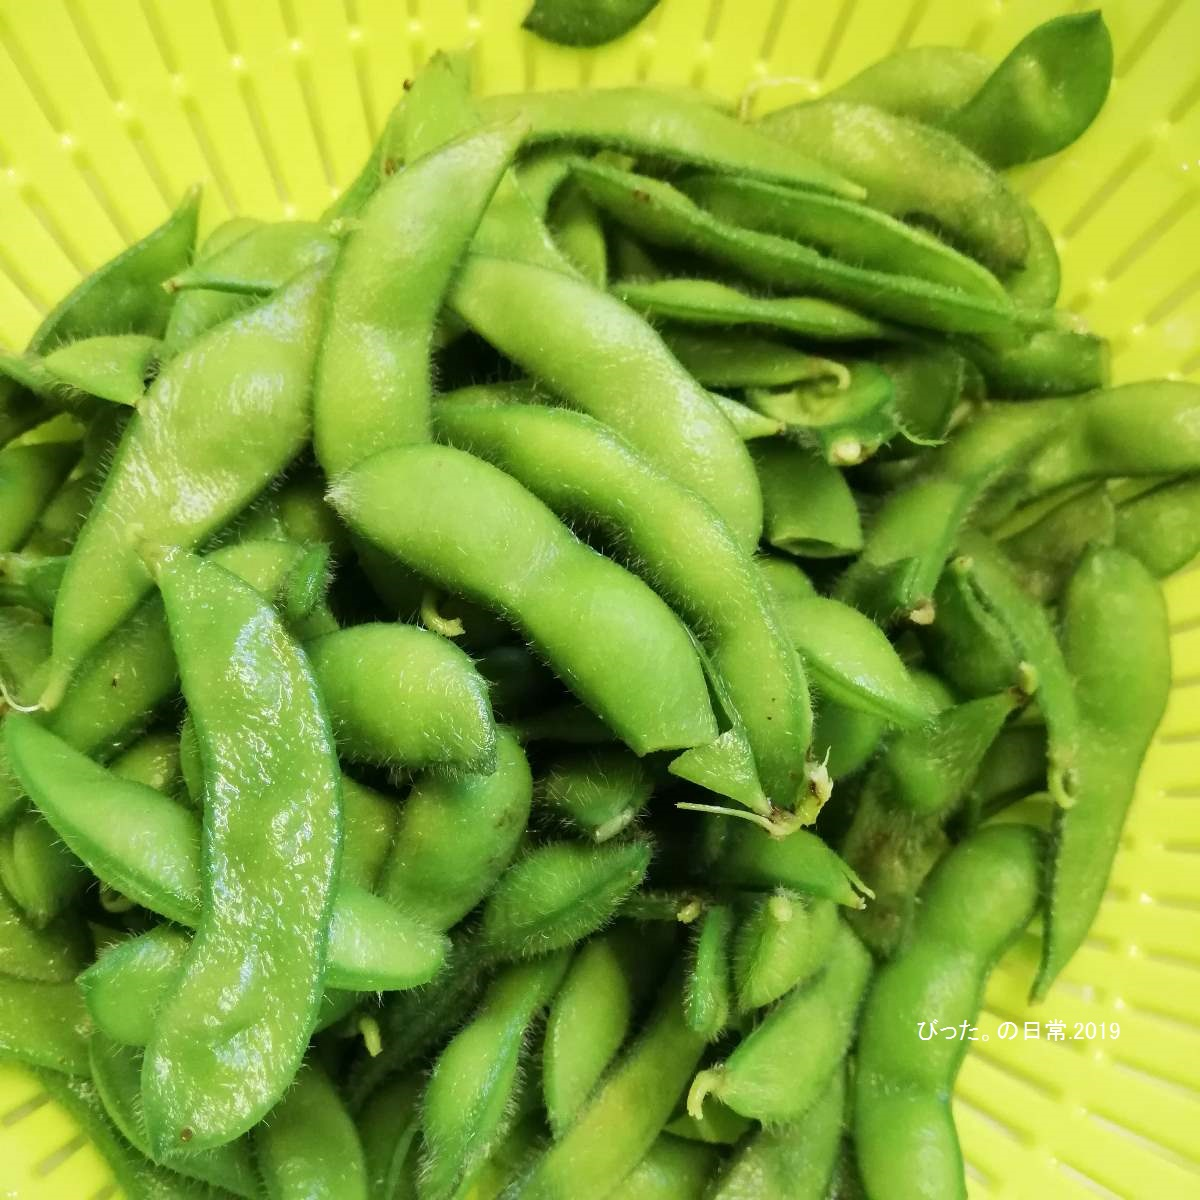 枝豆,Edamame